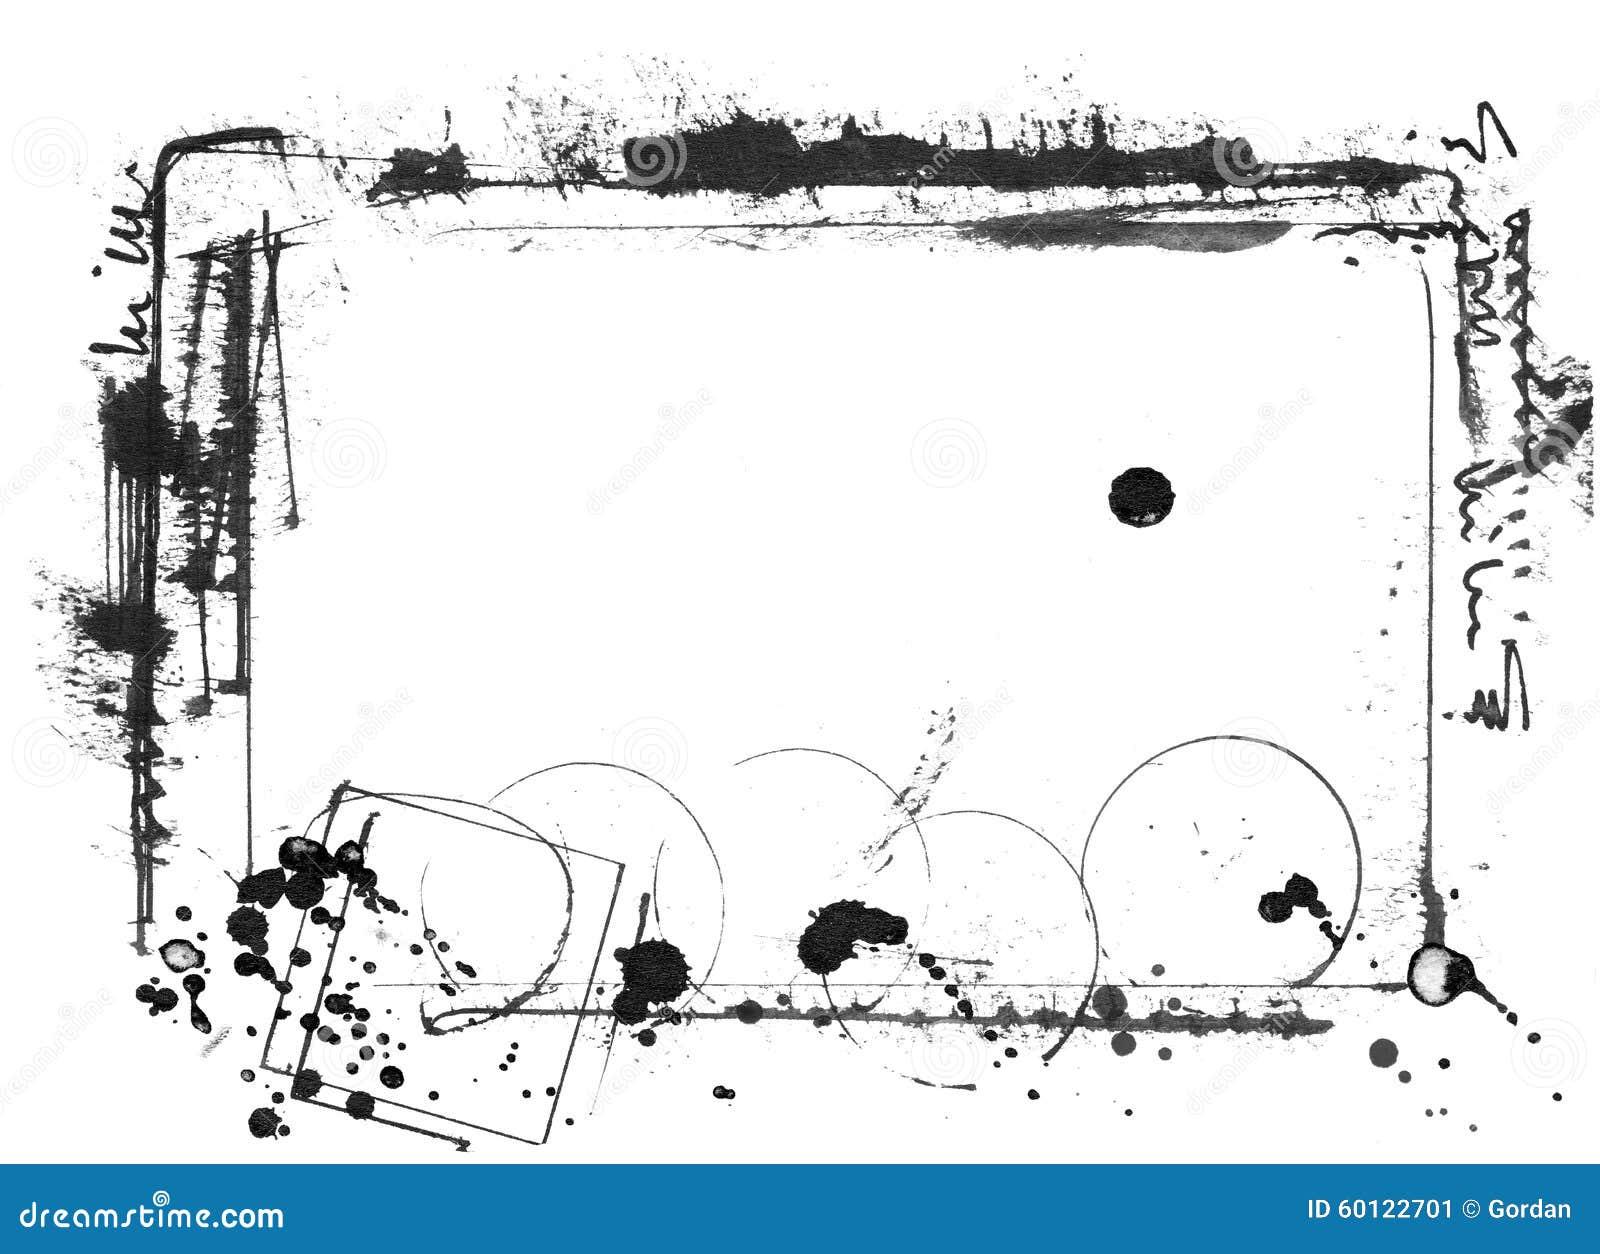 Ink Frame, Hand Painted Black On White, Nice Stock Illustration ...